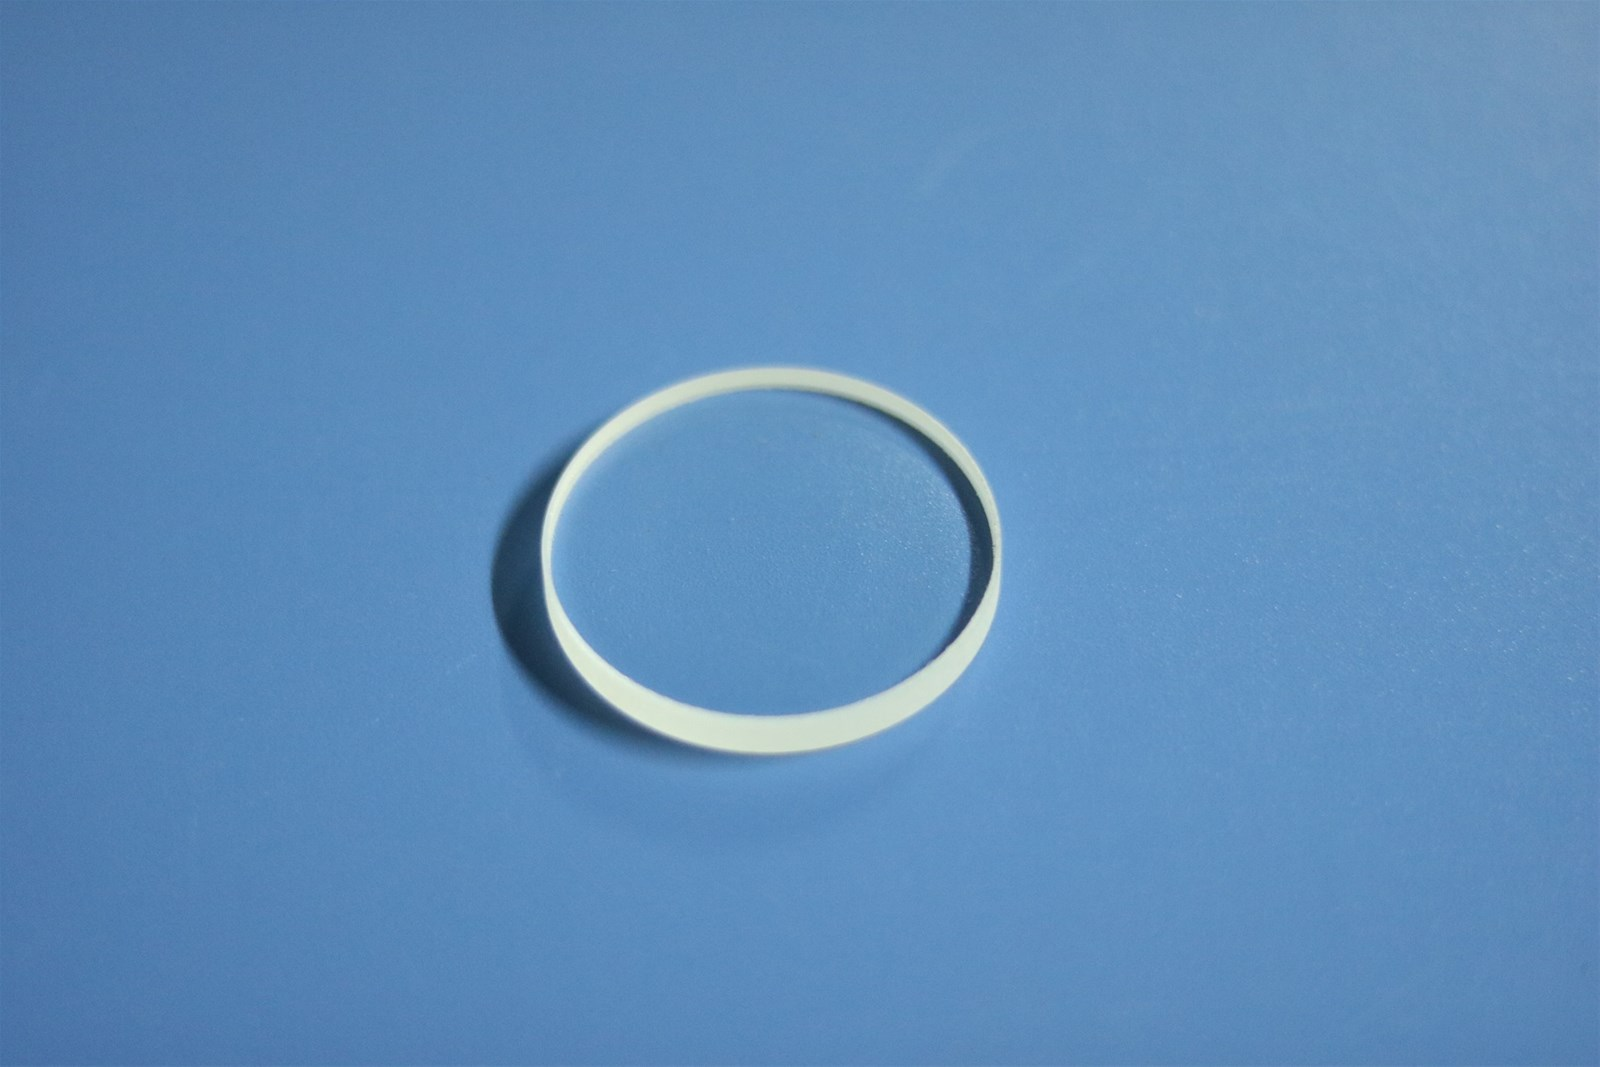 BK7 convex lenses AR coated 350600nm